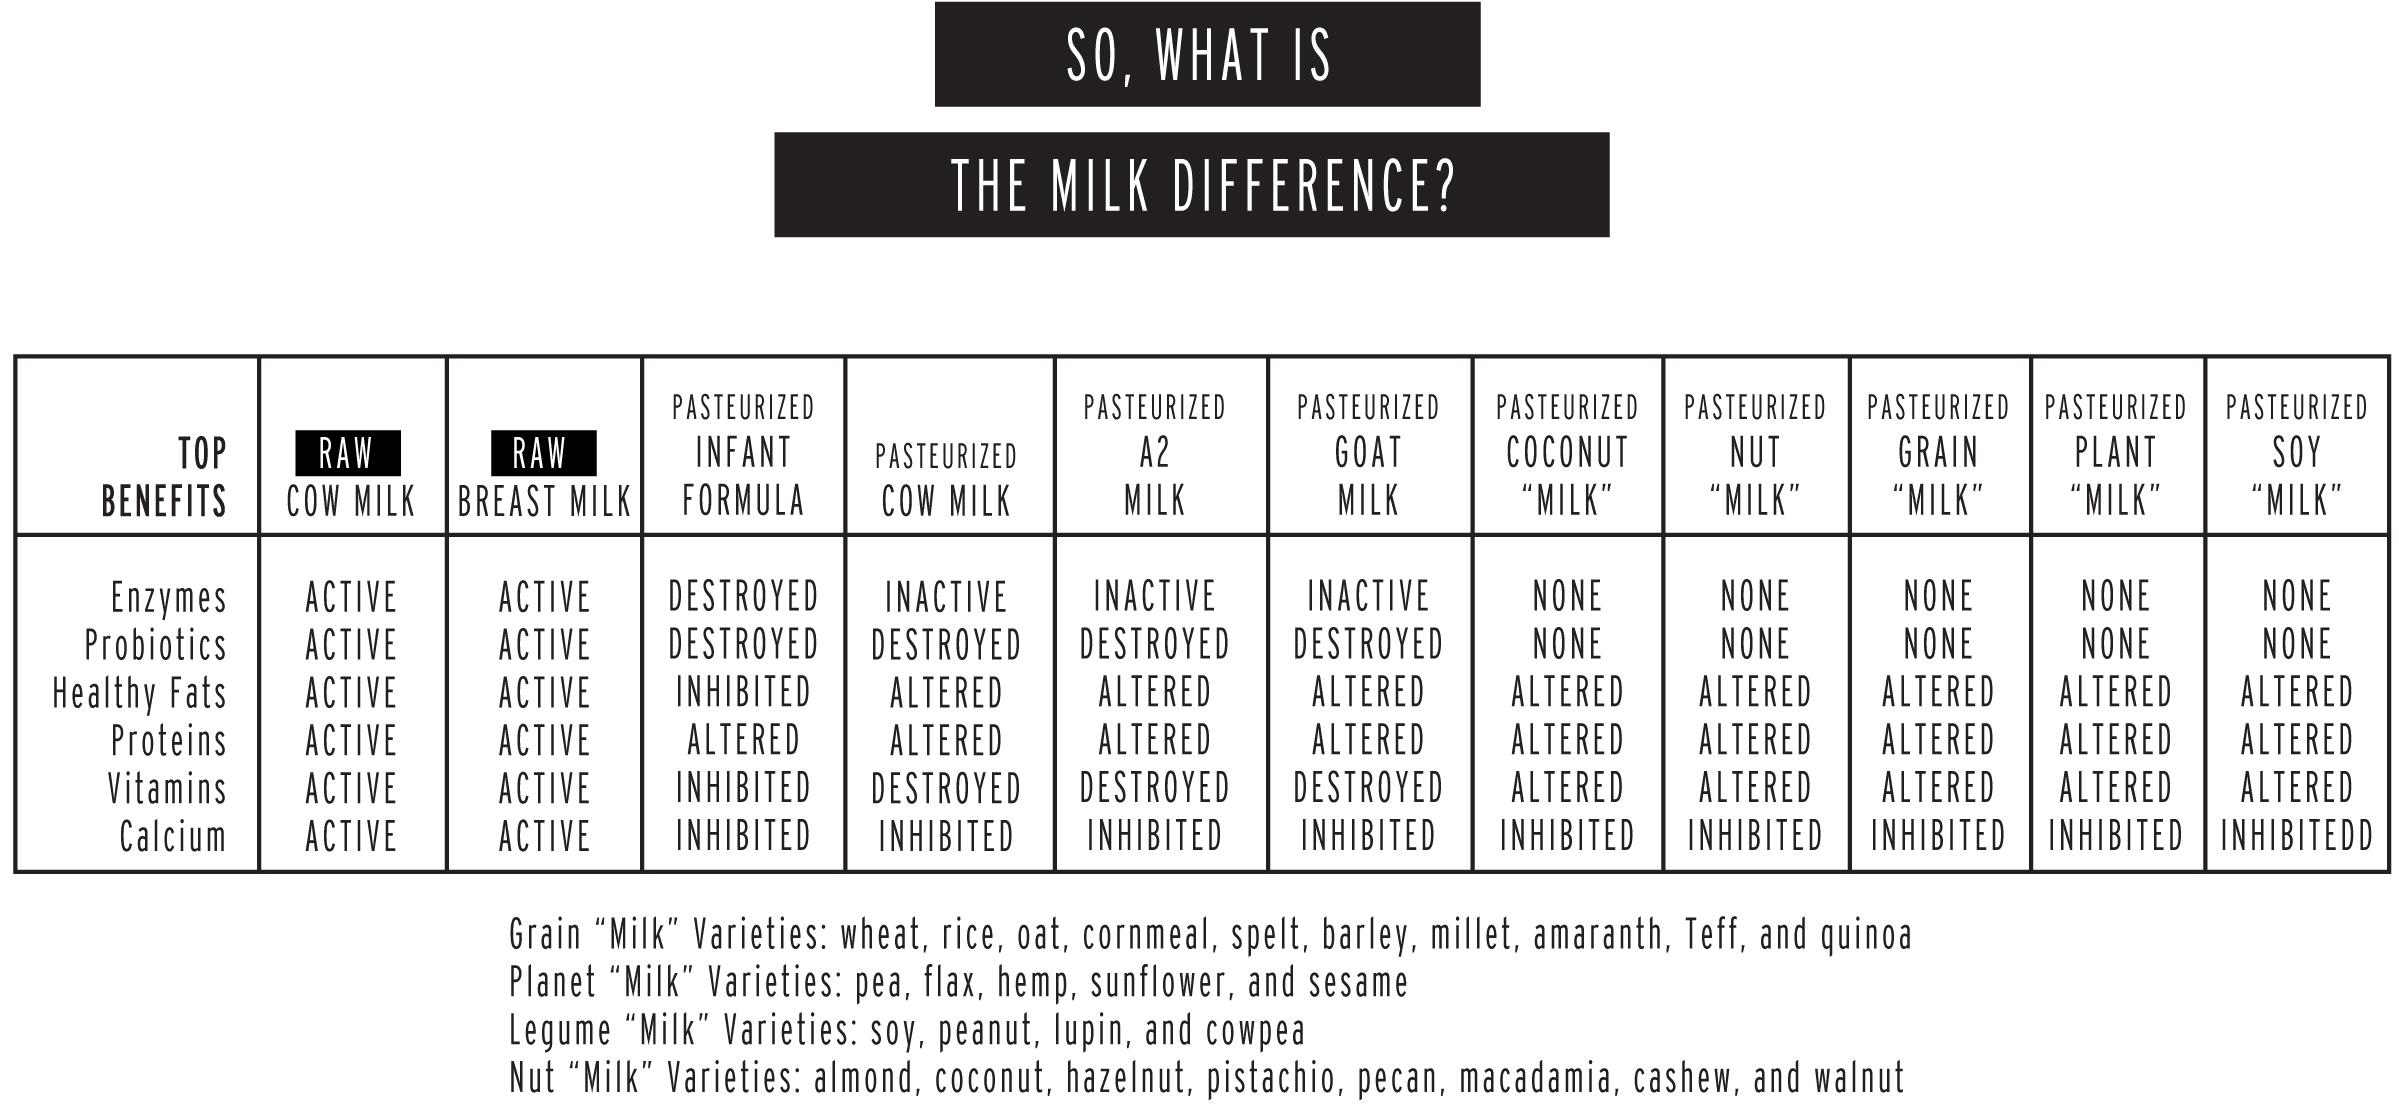 RAW MILK DIFFERENCE CHART.jpg